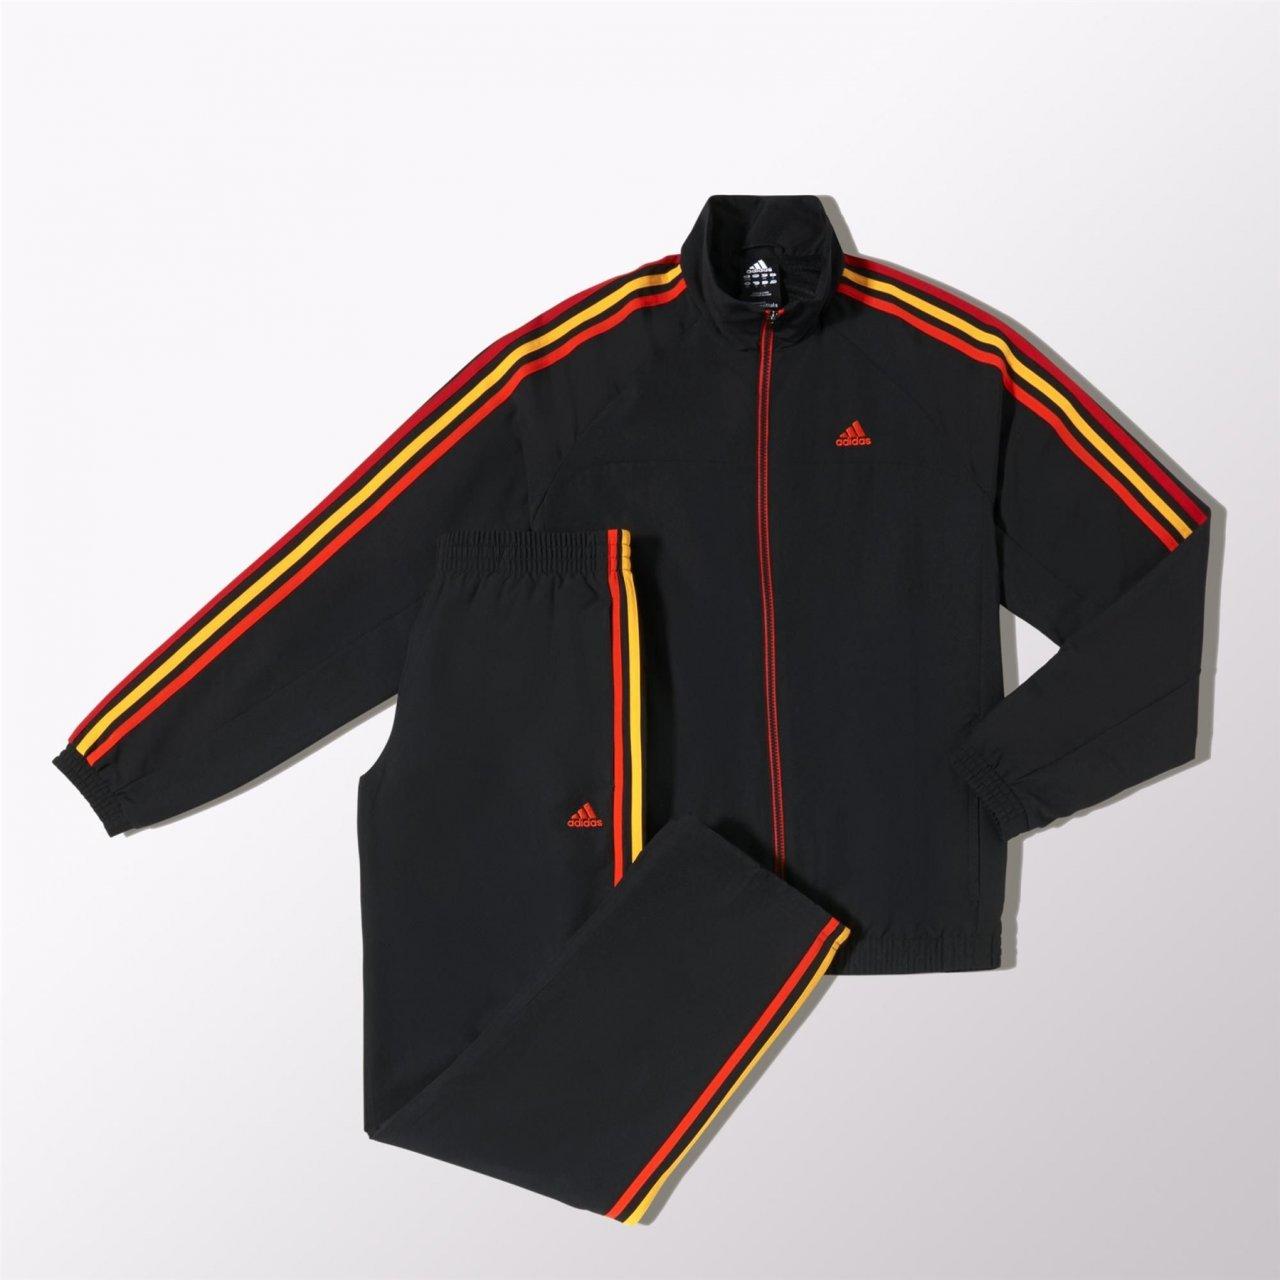 adidas Ess 3S - Chándal para hombre, color negro y naranja black ...